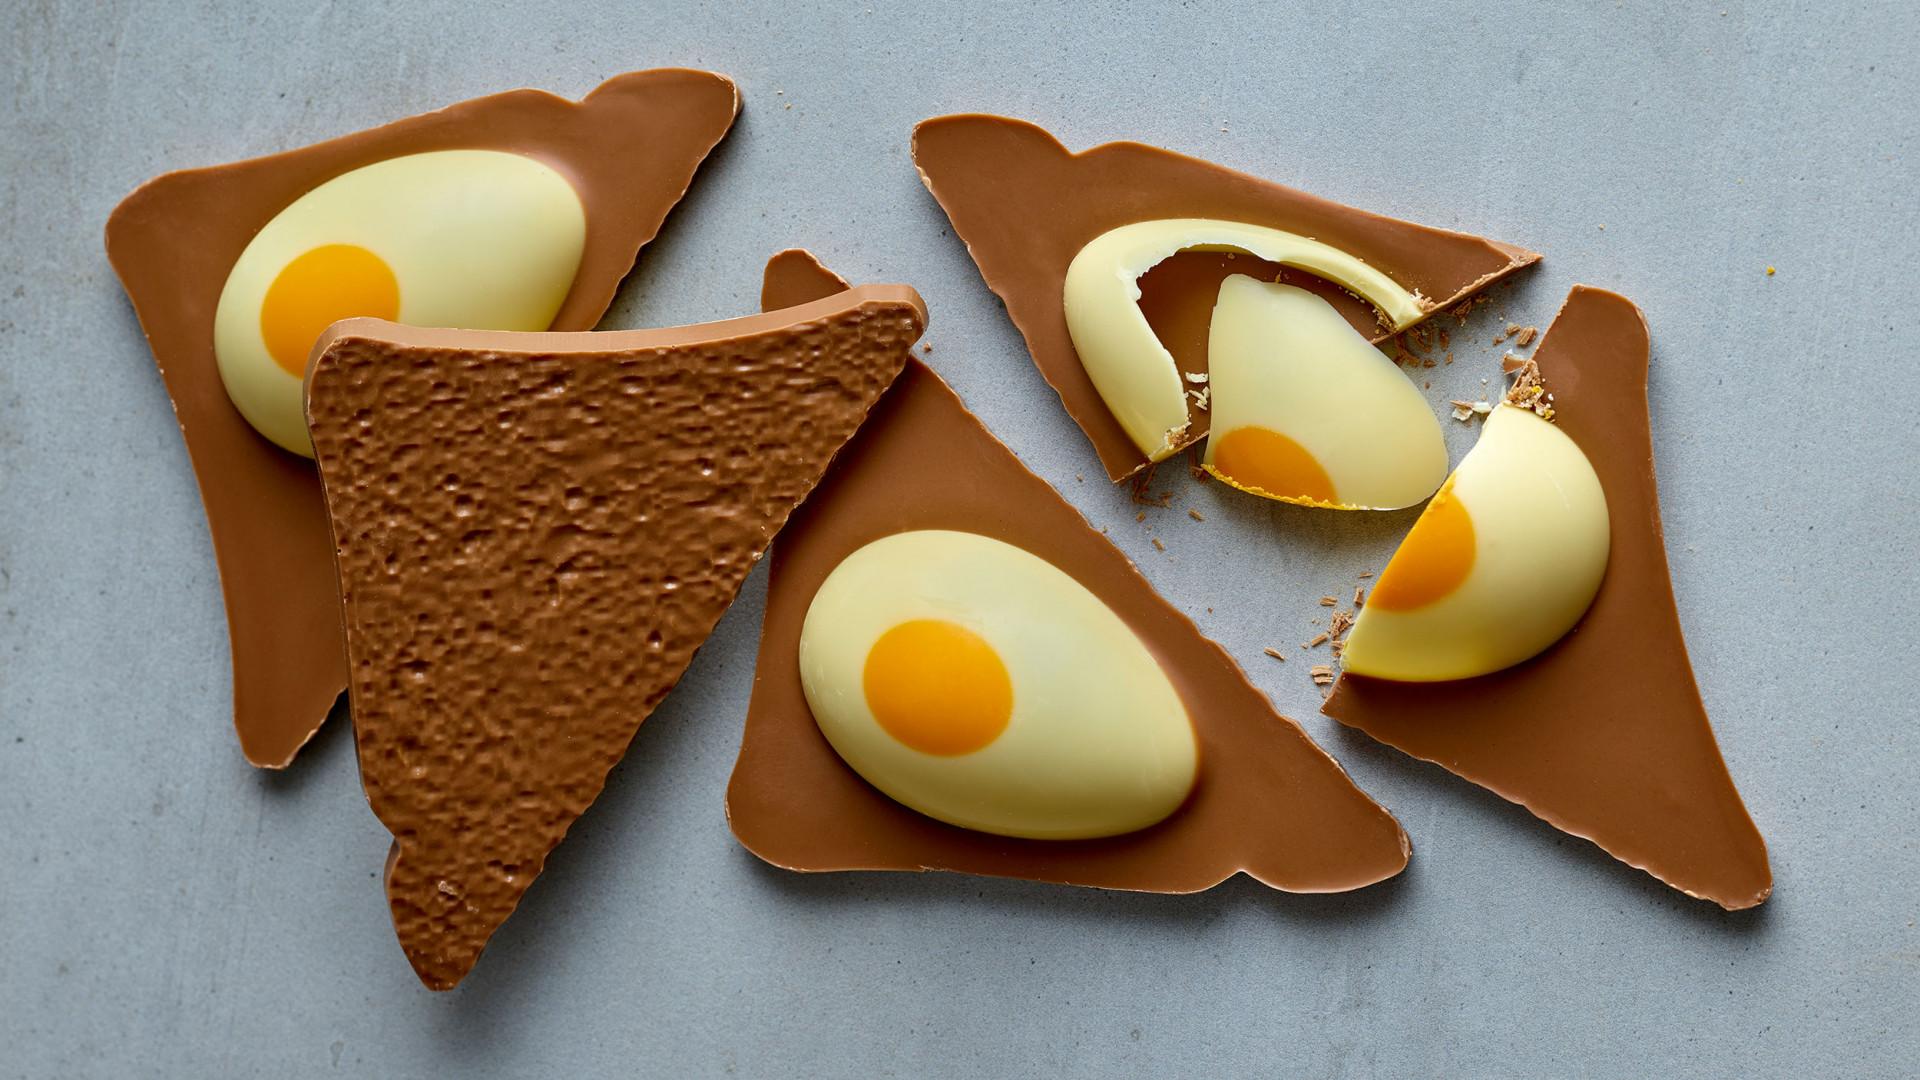 Easter 20201: Hotel Chocolat's Caramayo Egg Sandwich